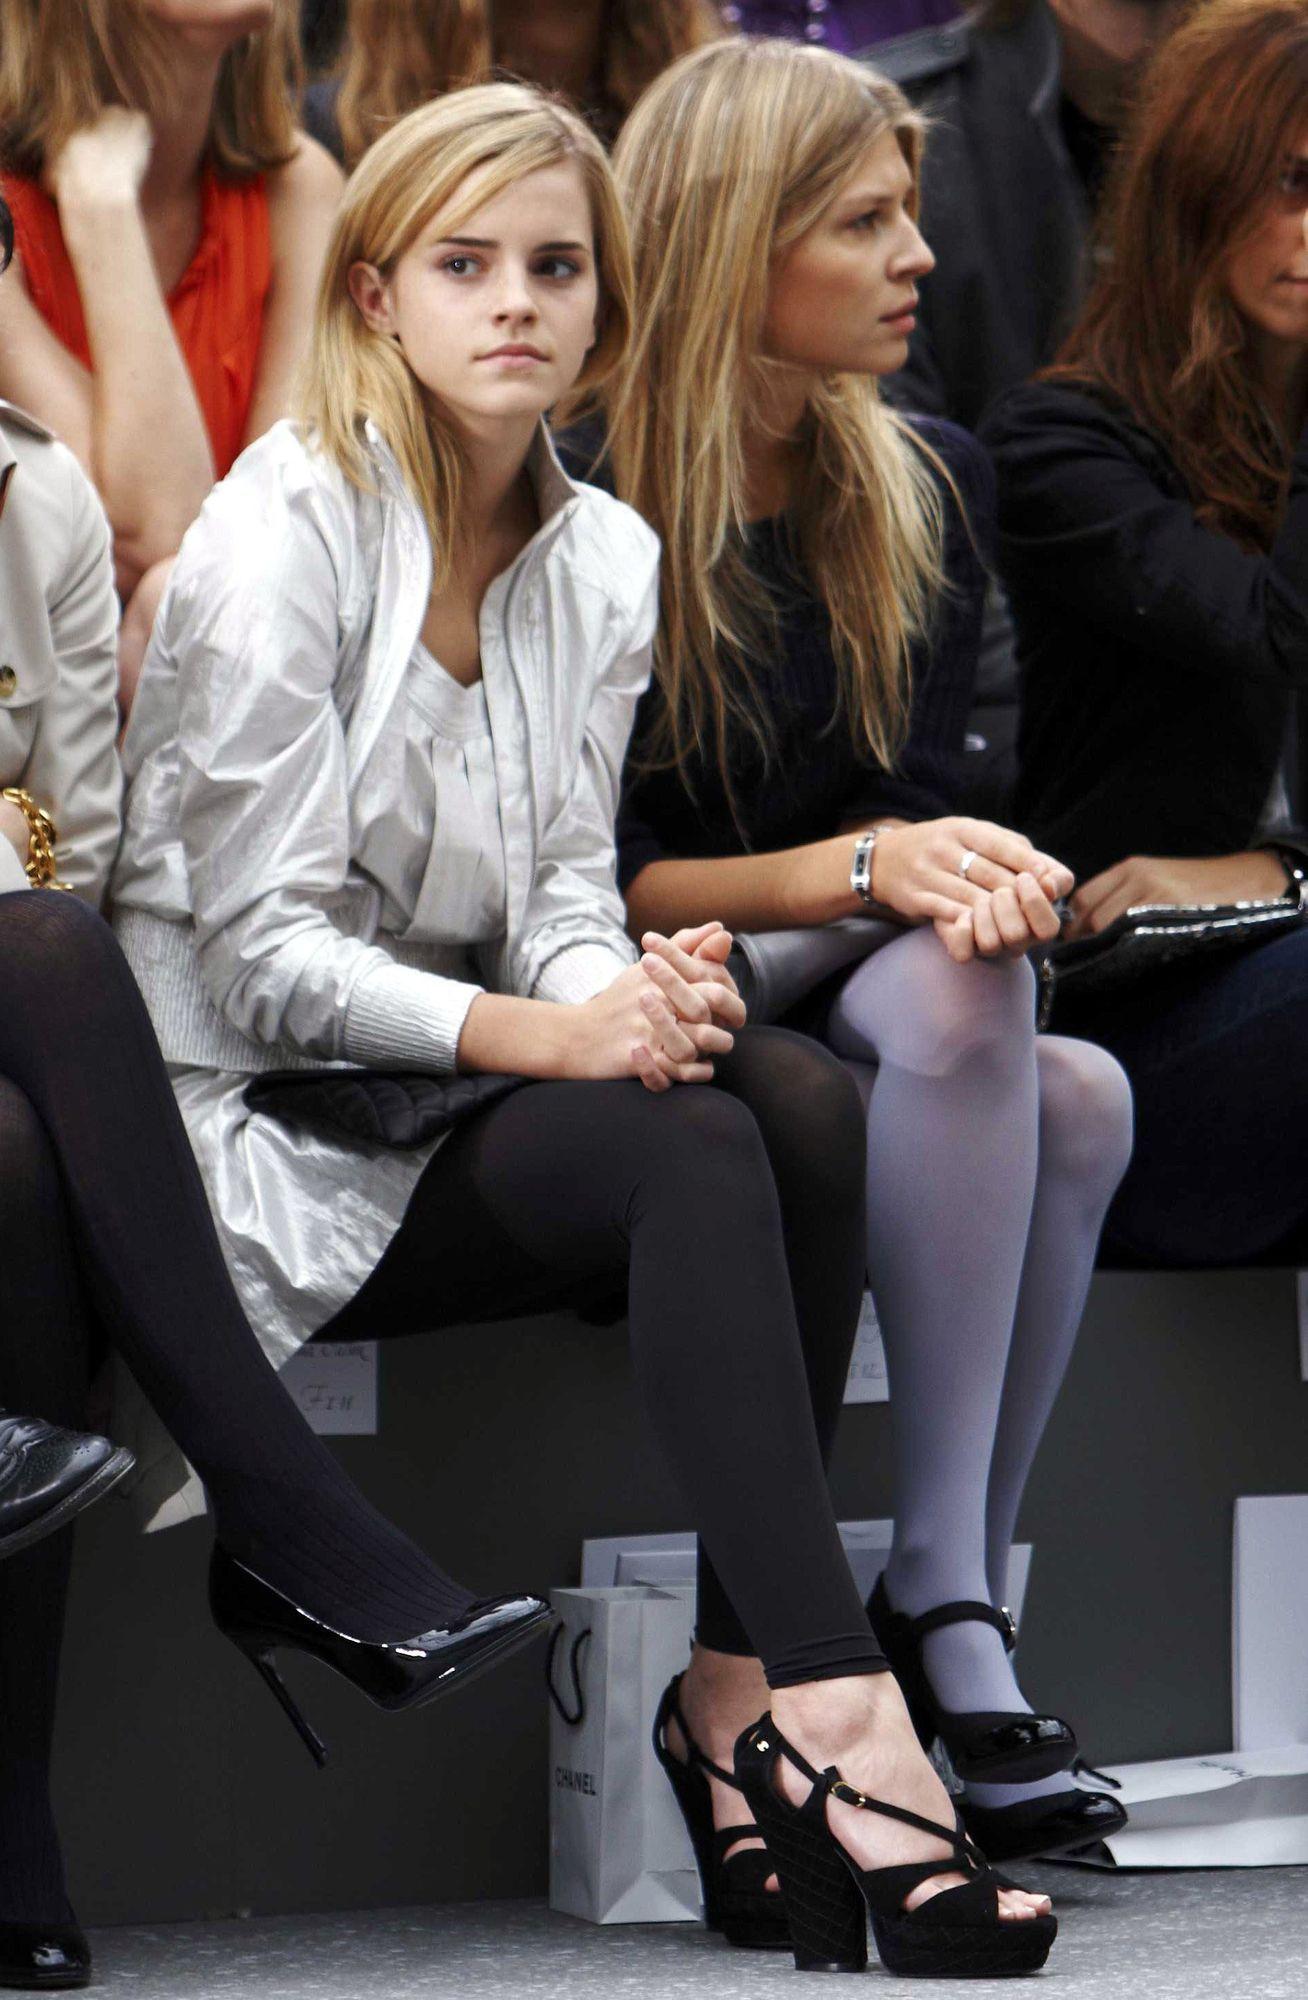 Paris Fashion Week Chanel 044 I Heart Watson Emma Watson Paris Fashion Week Mommy Daughter Photos